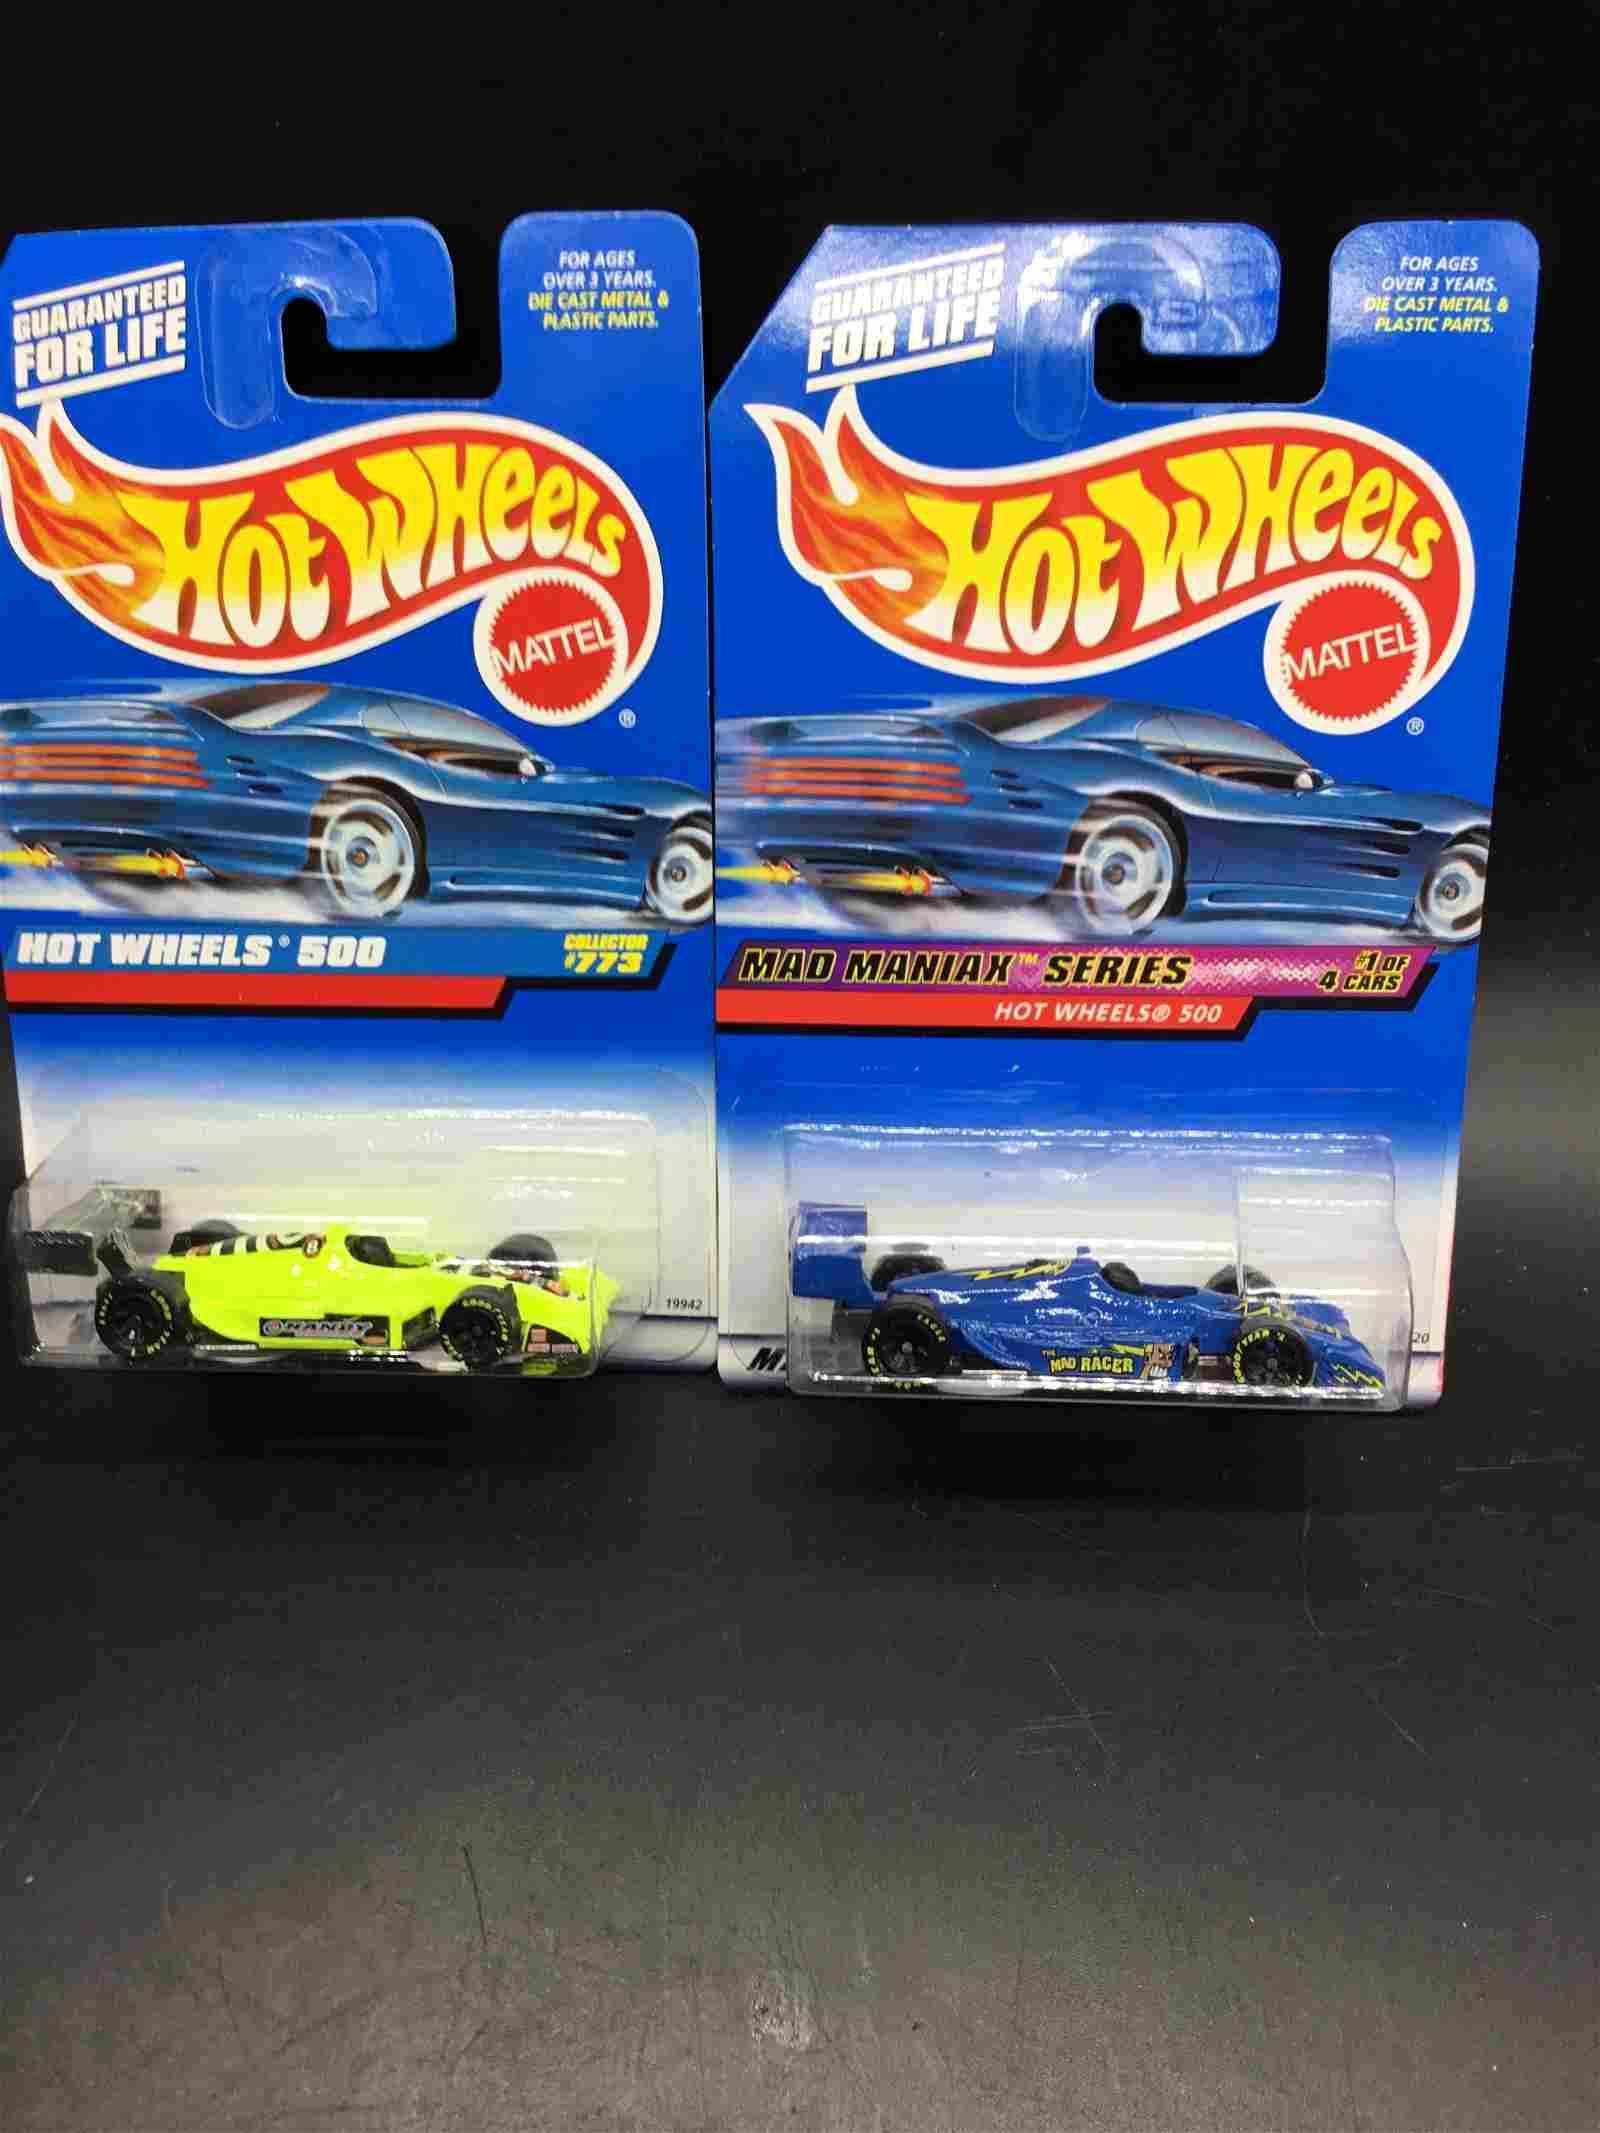 2 car set of Hot Wheels 500